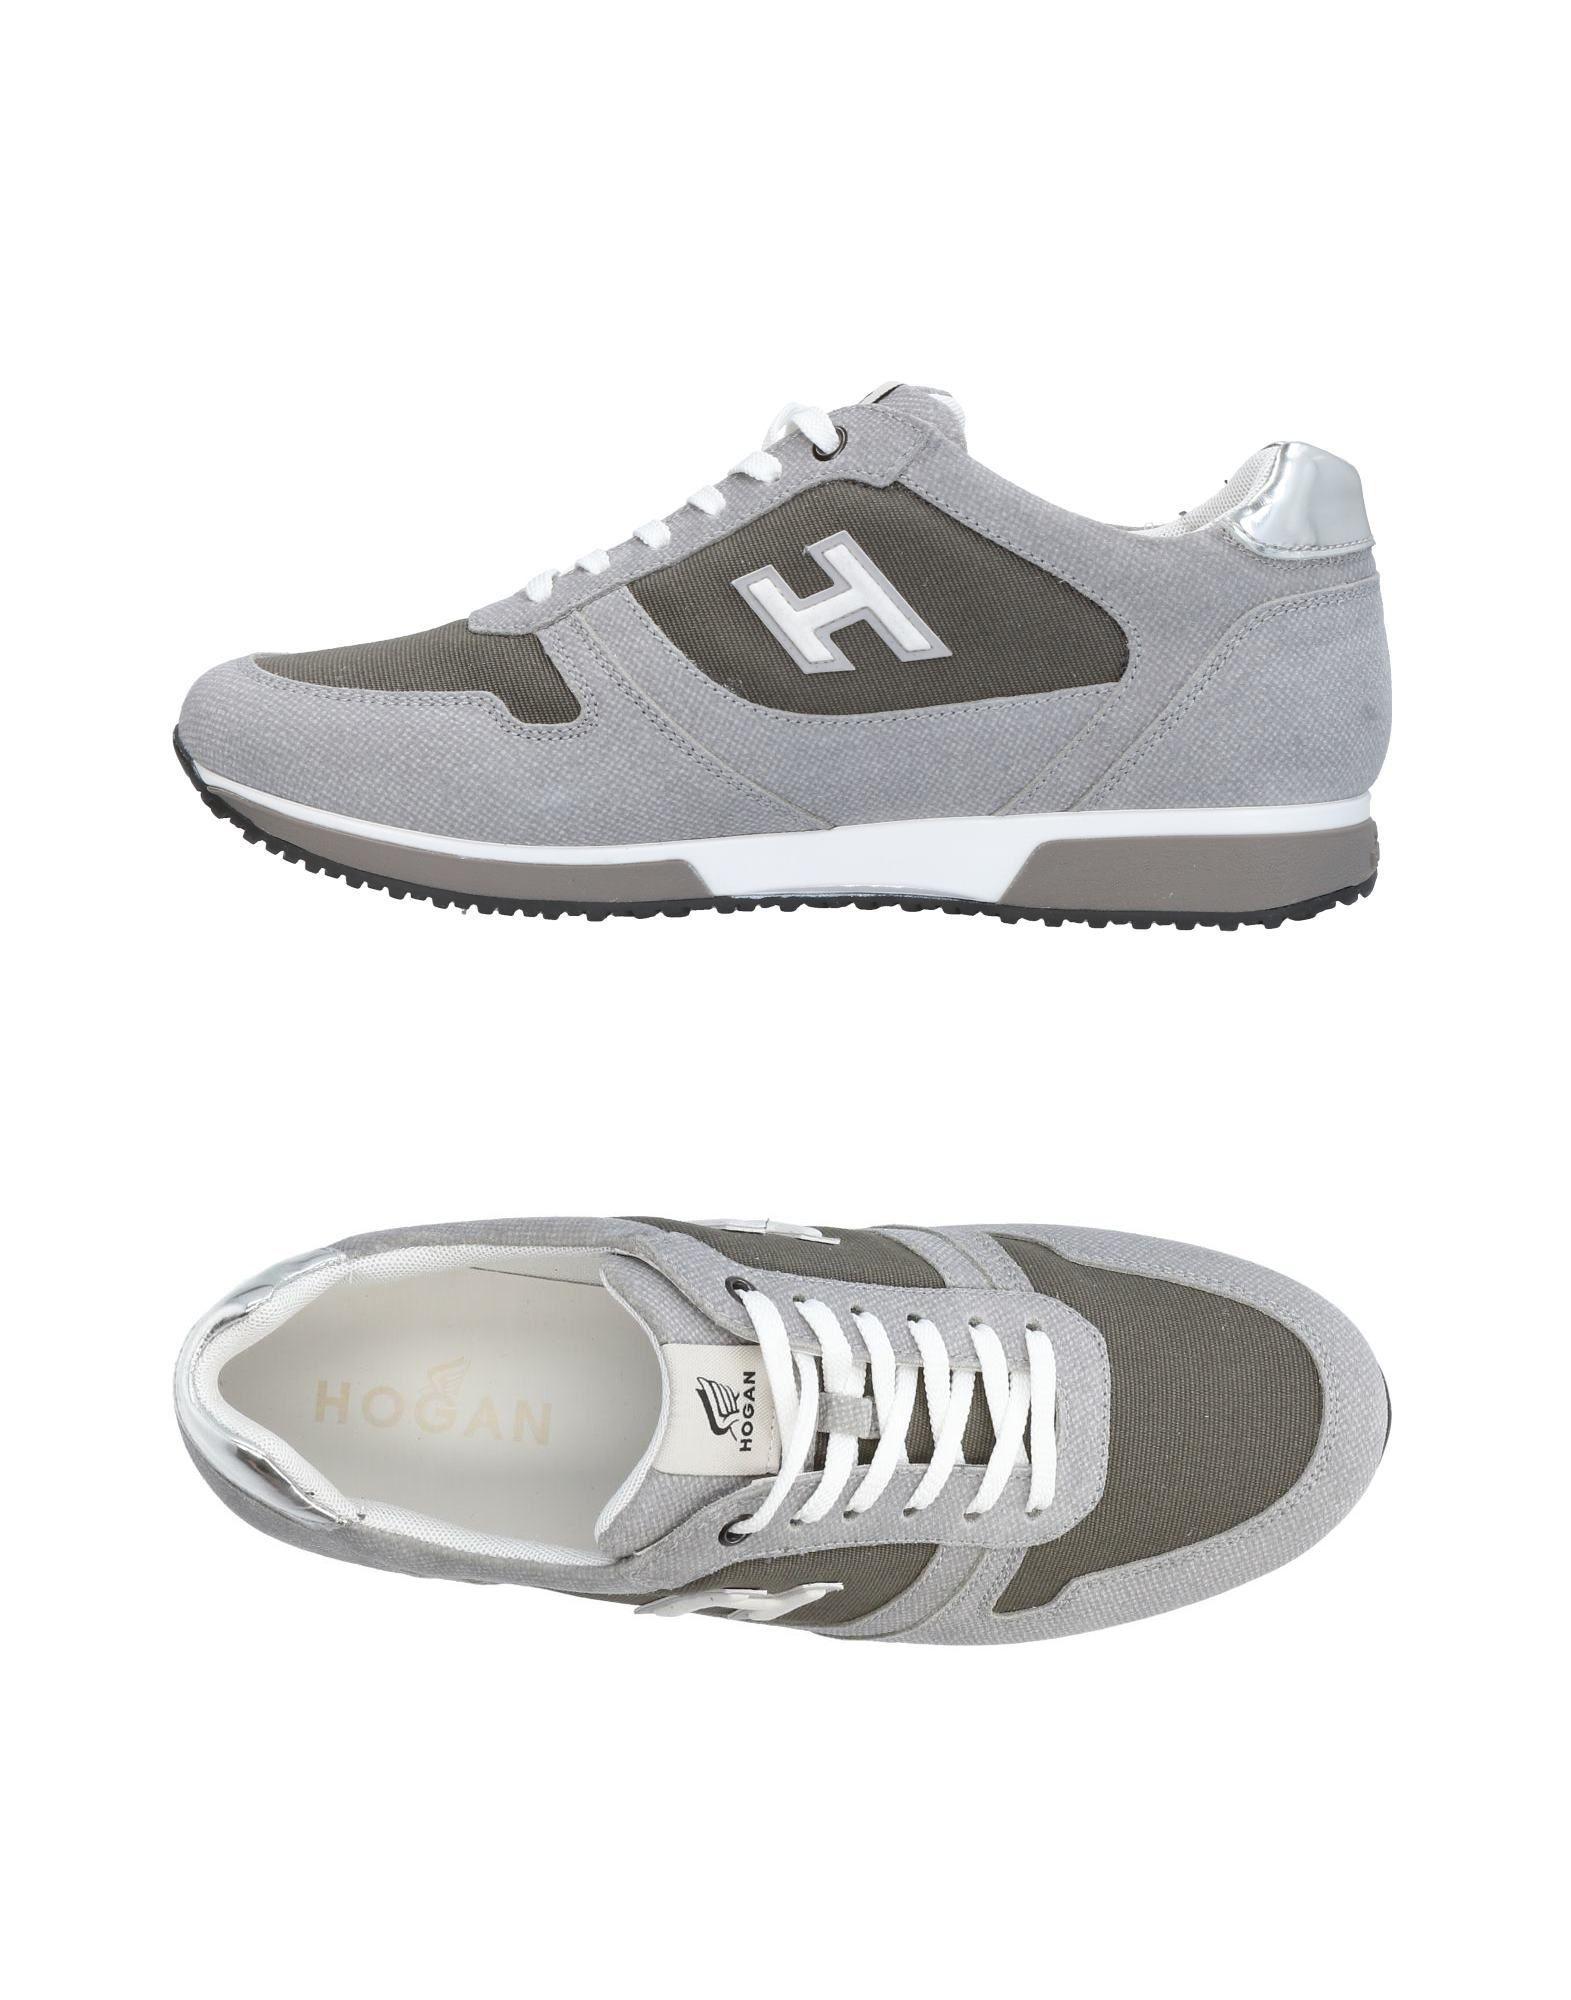 Hogan Sneakers Herren  11435511GU Gute Qualität beliebte Schuhe